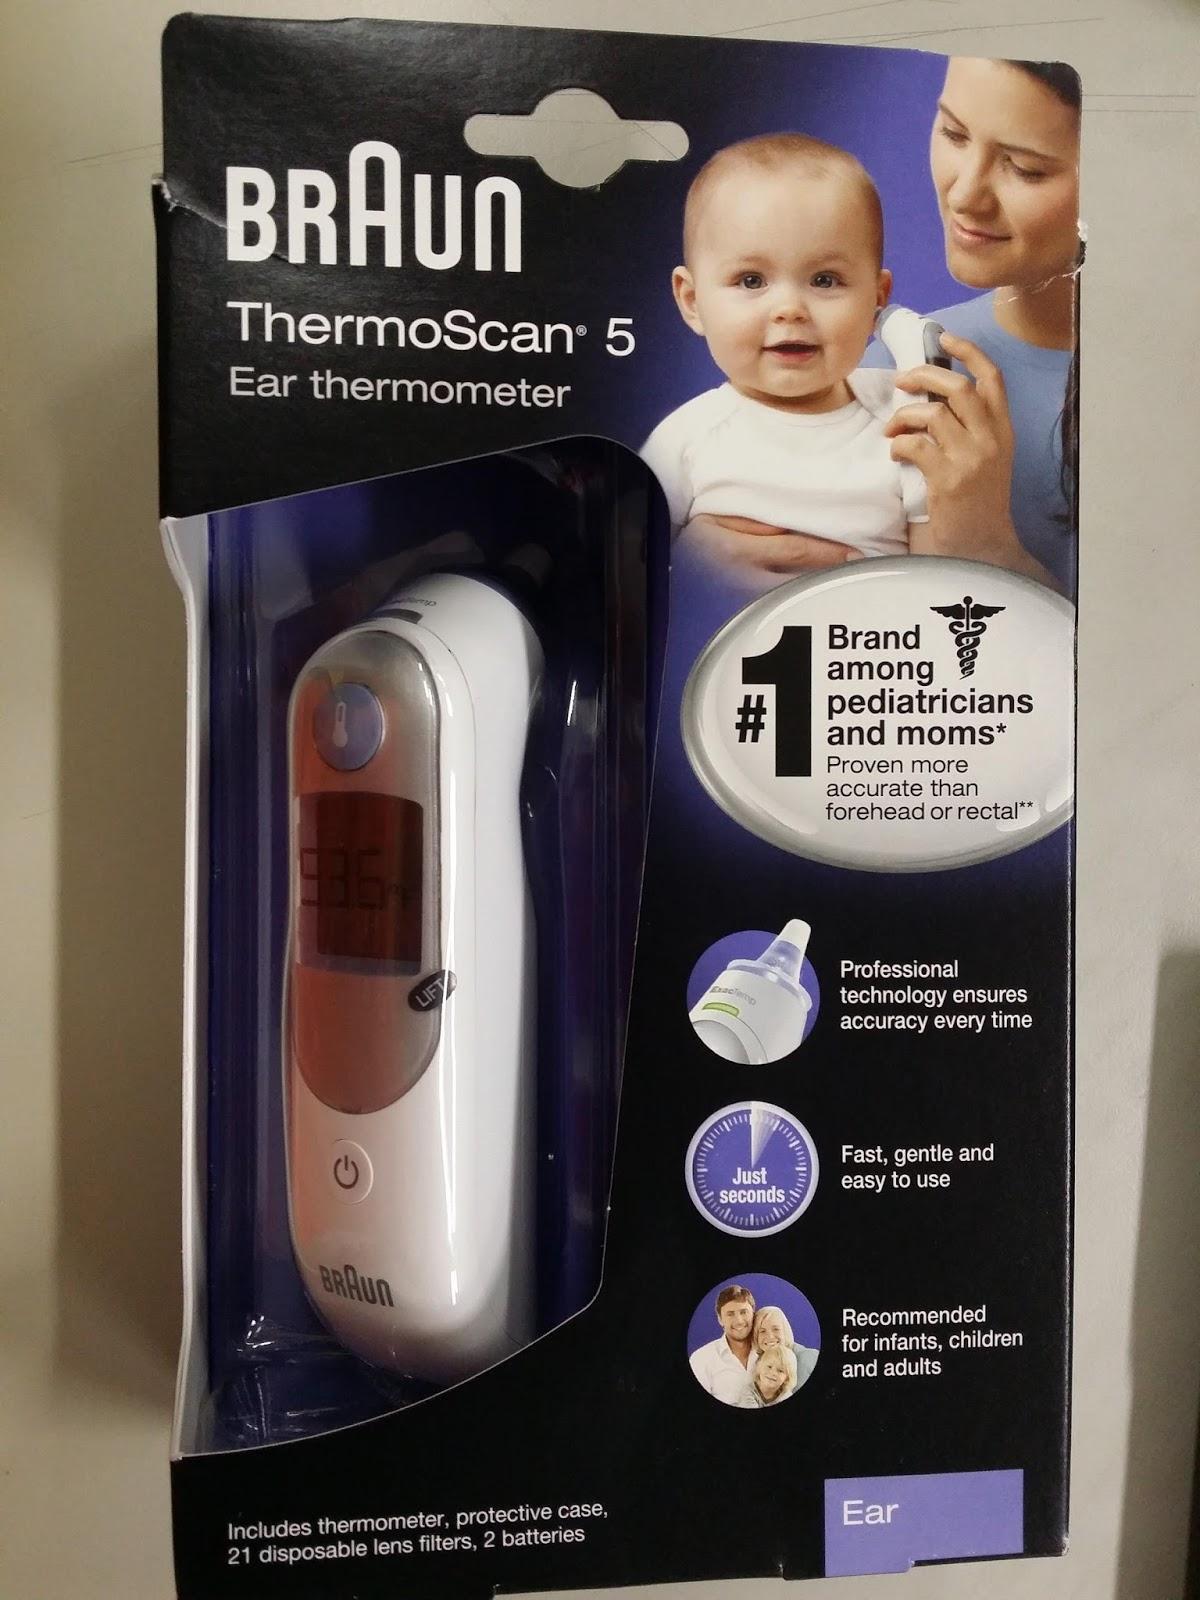 Braun thermoscan 5 test